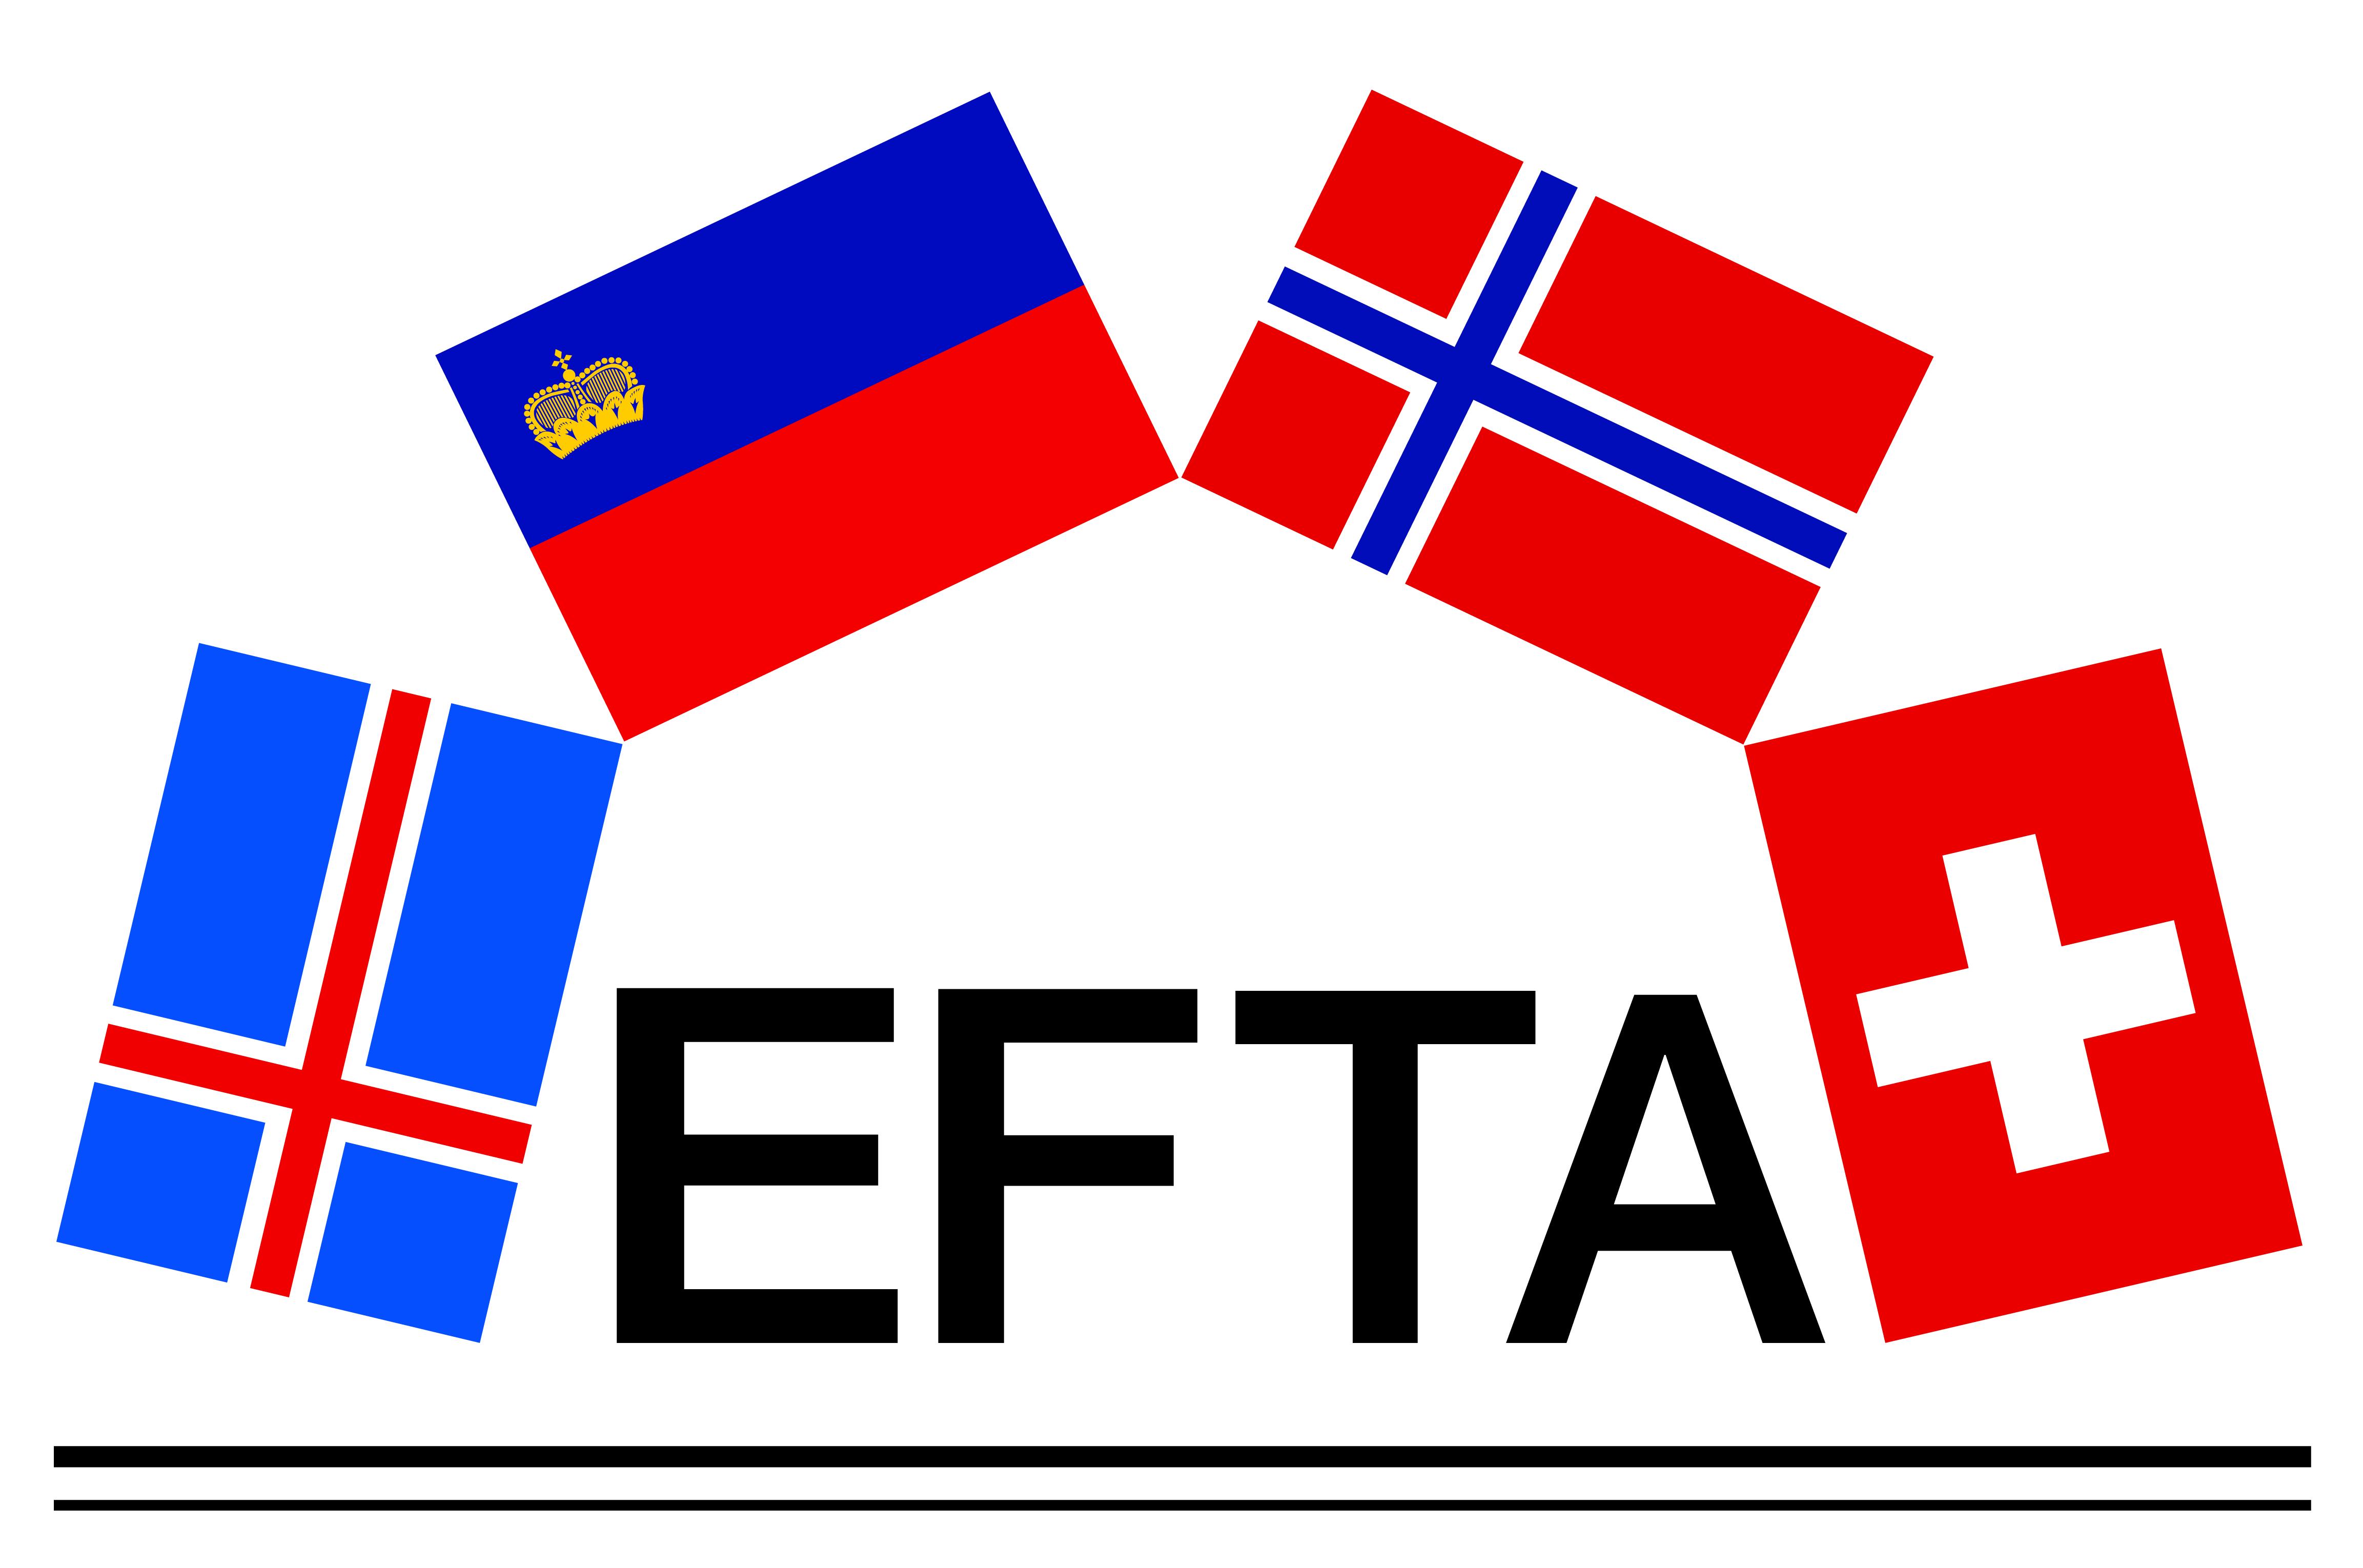 logo for European Free Trade Association